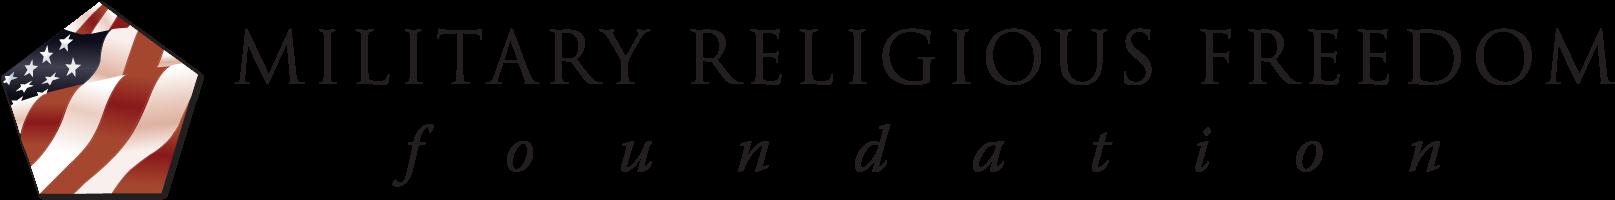 Military Religious Freedom Foundation home